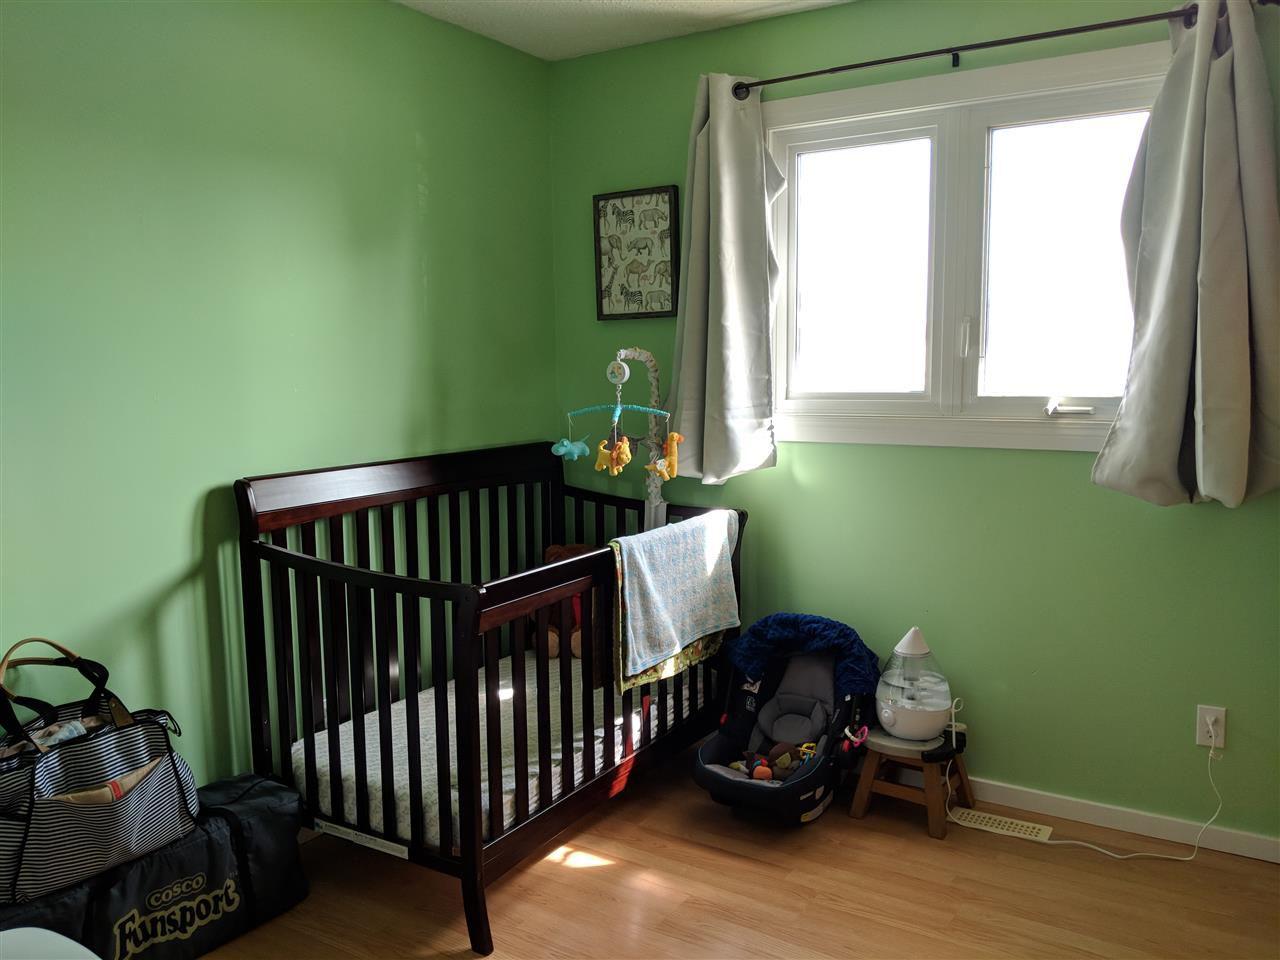 Photo 11: Photos: 4740 48 Street S: Clyde House for sale : MLS®# E4152983